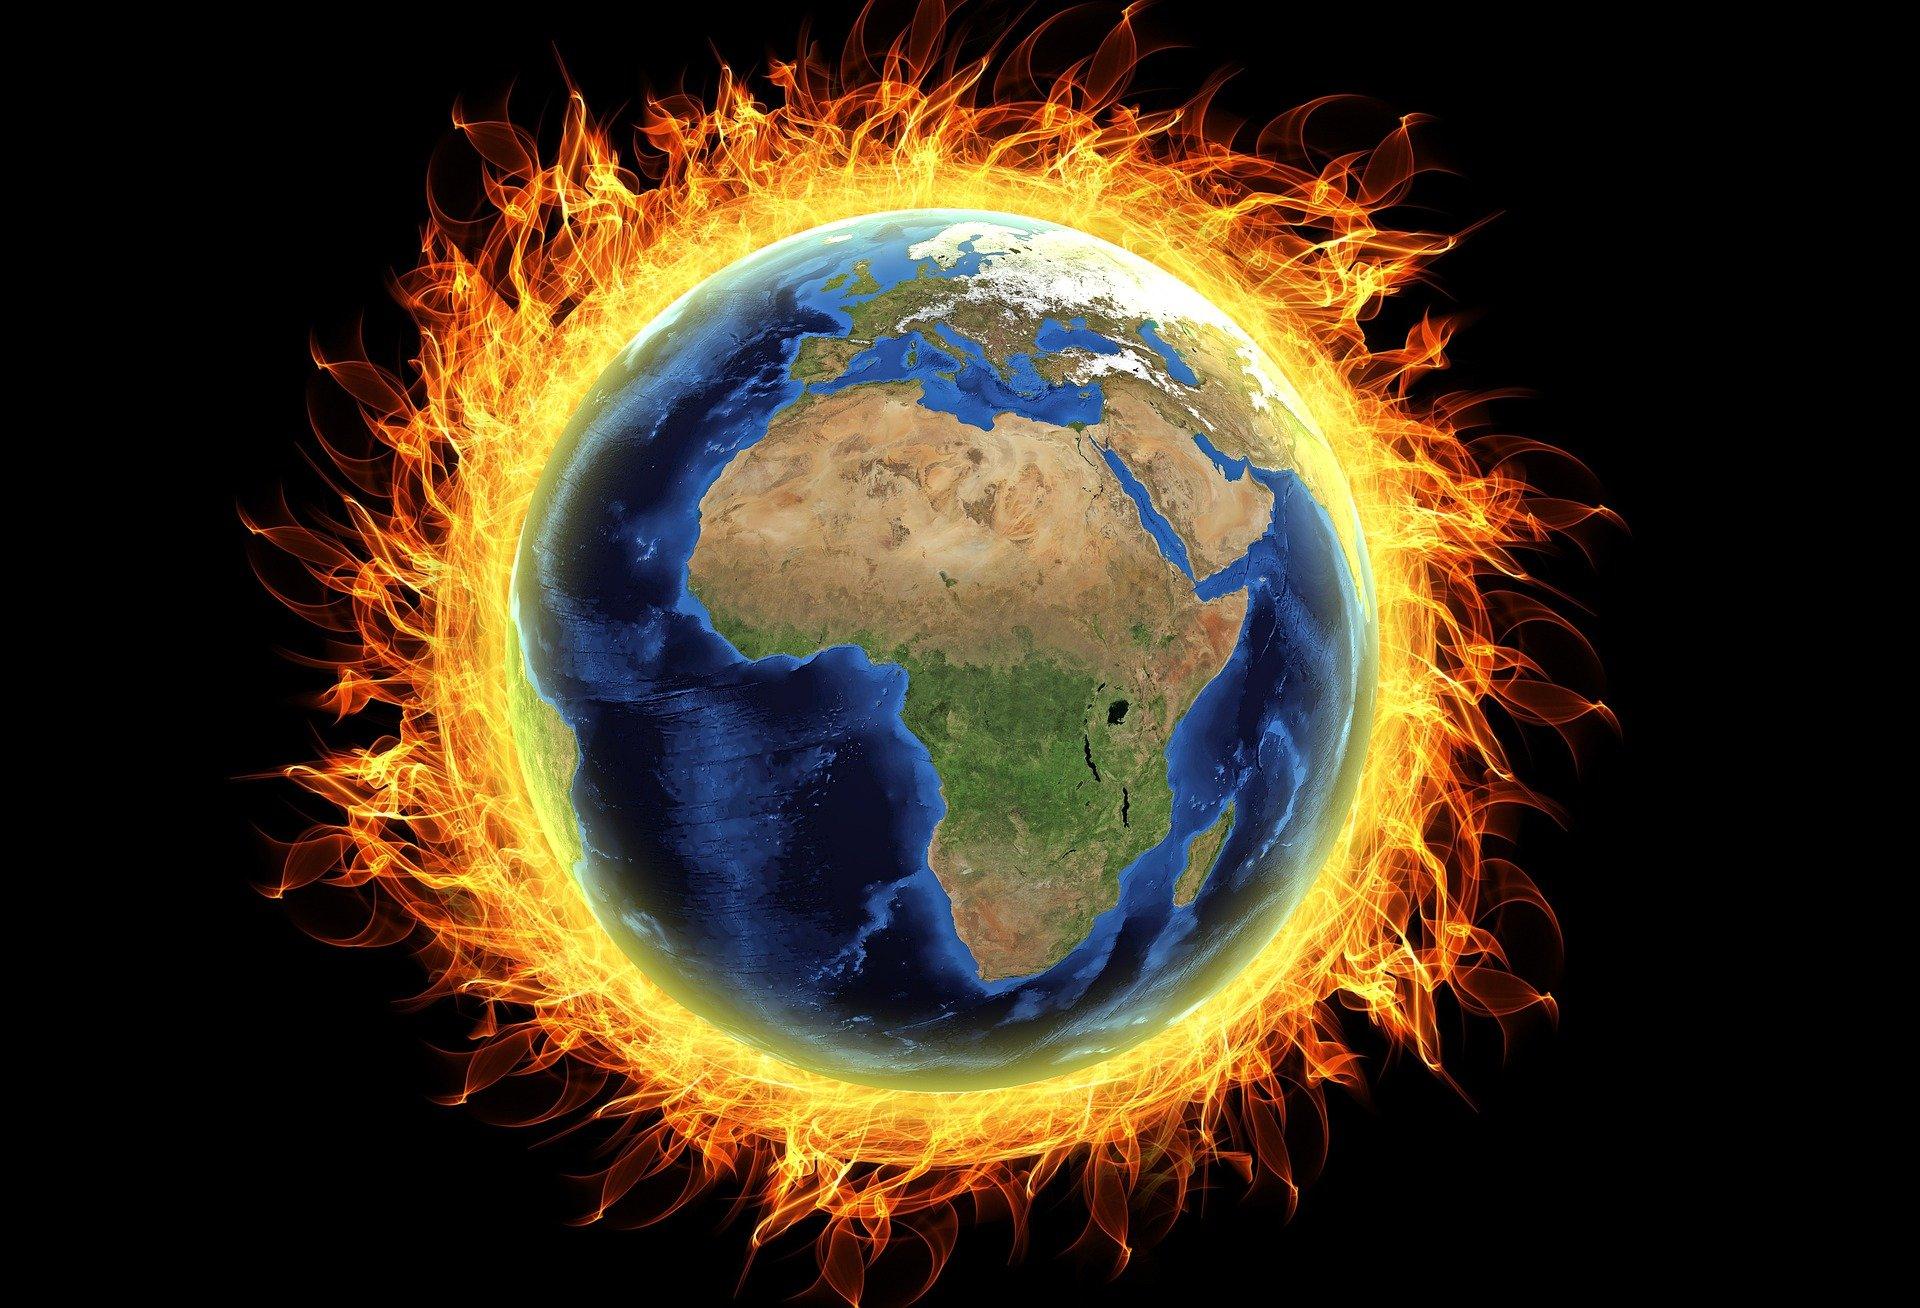 world burning